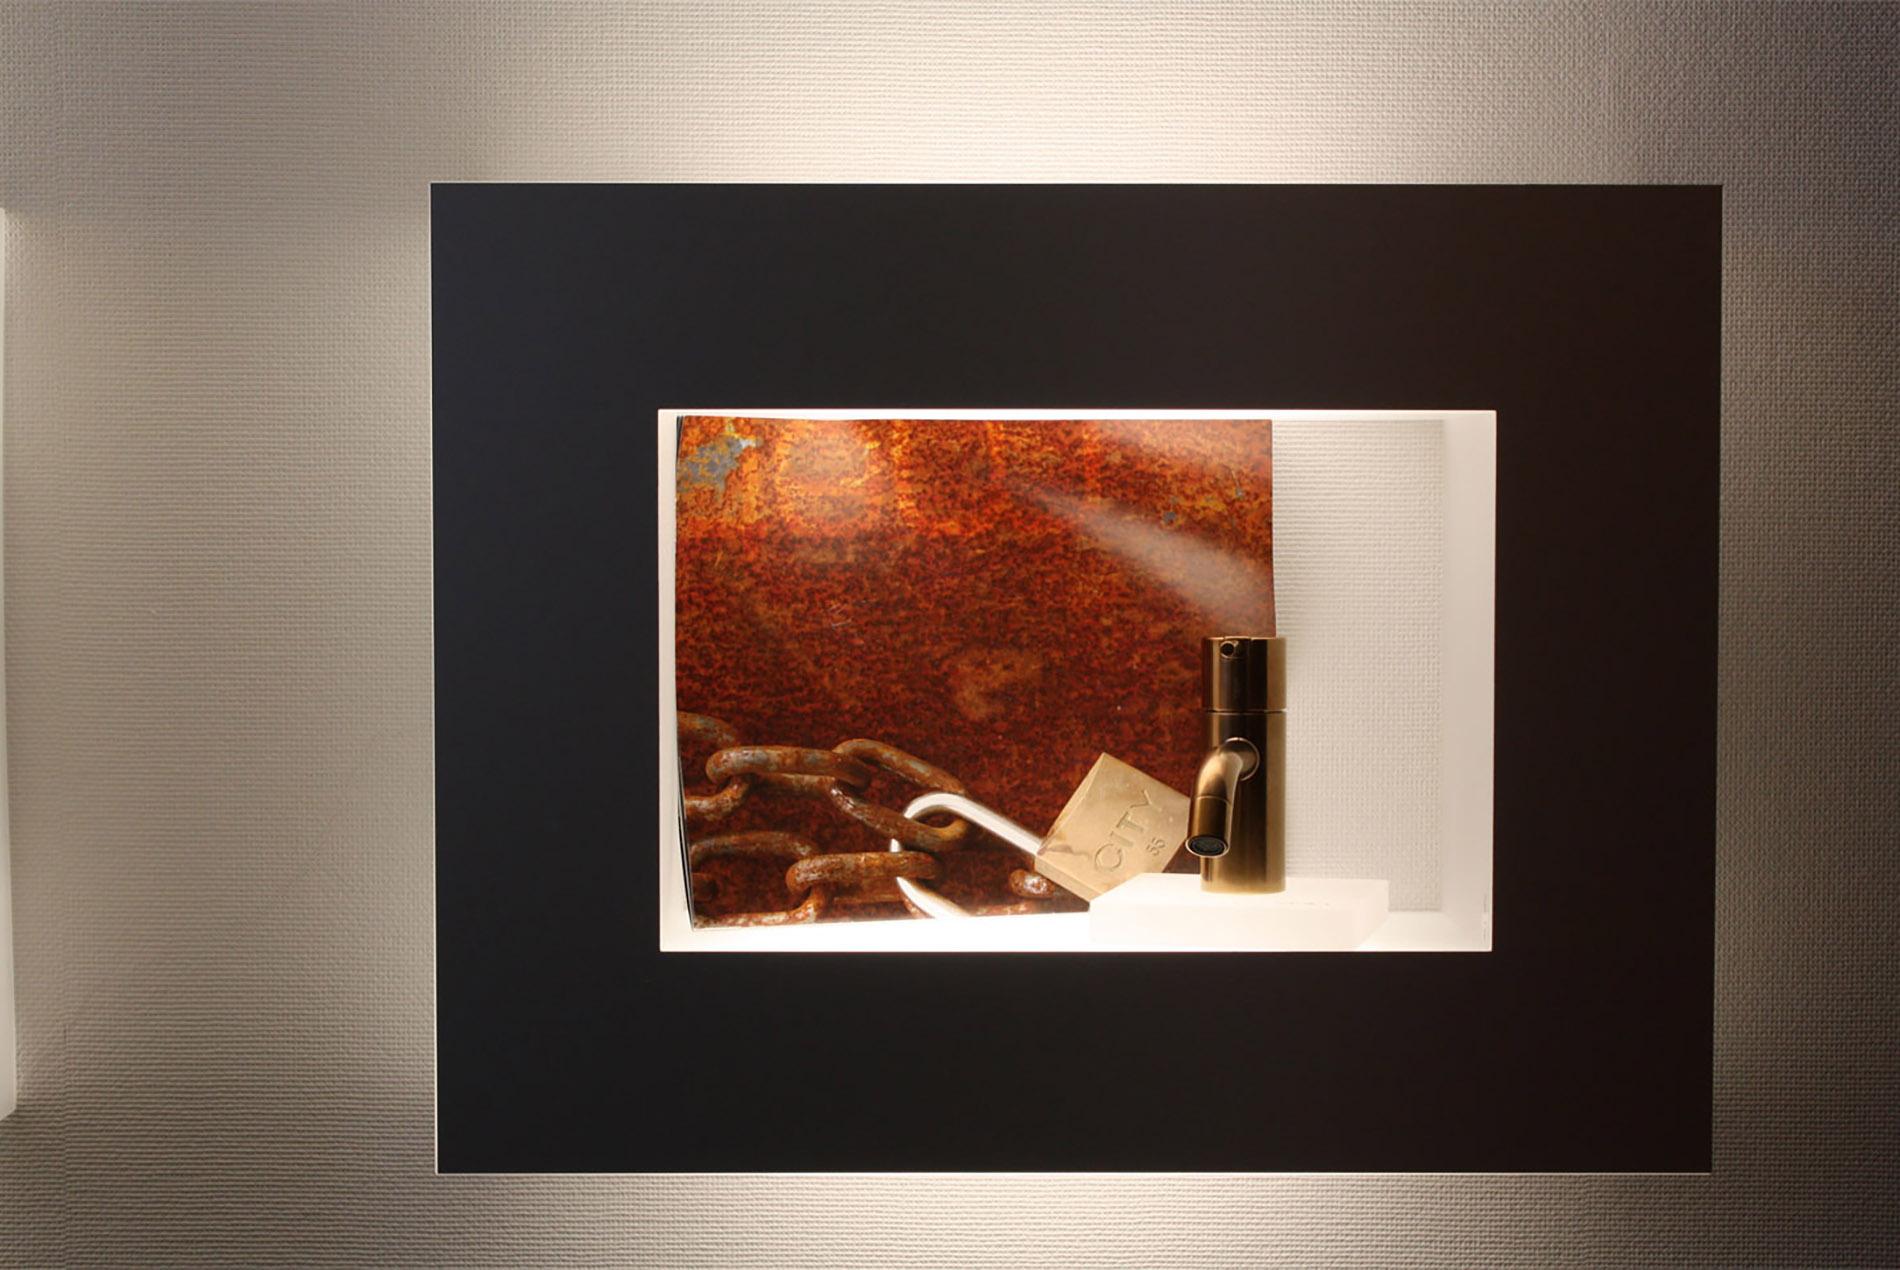 ludwig steup gmbh heizung sanit r partner der raumfabrik. Black Bedroom Furniture Sets. Home Design Ideas